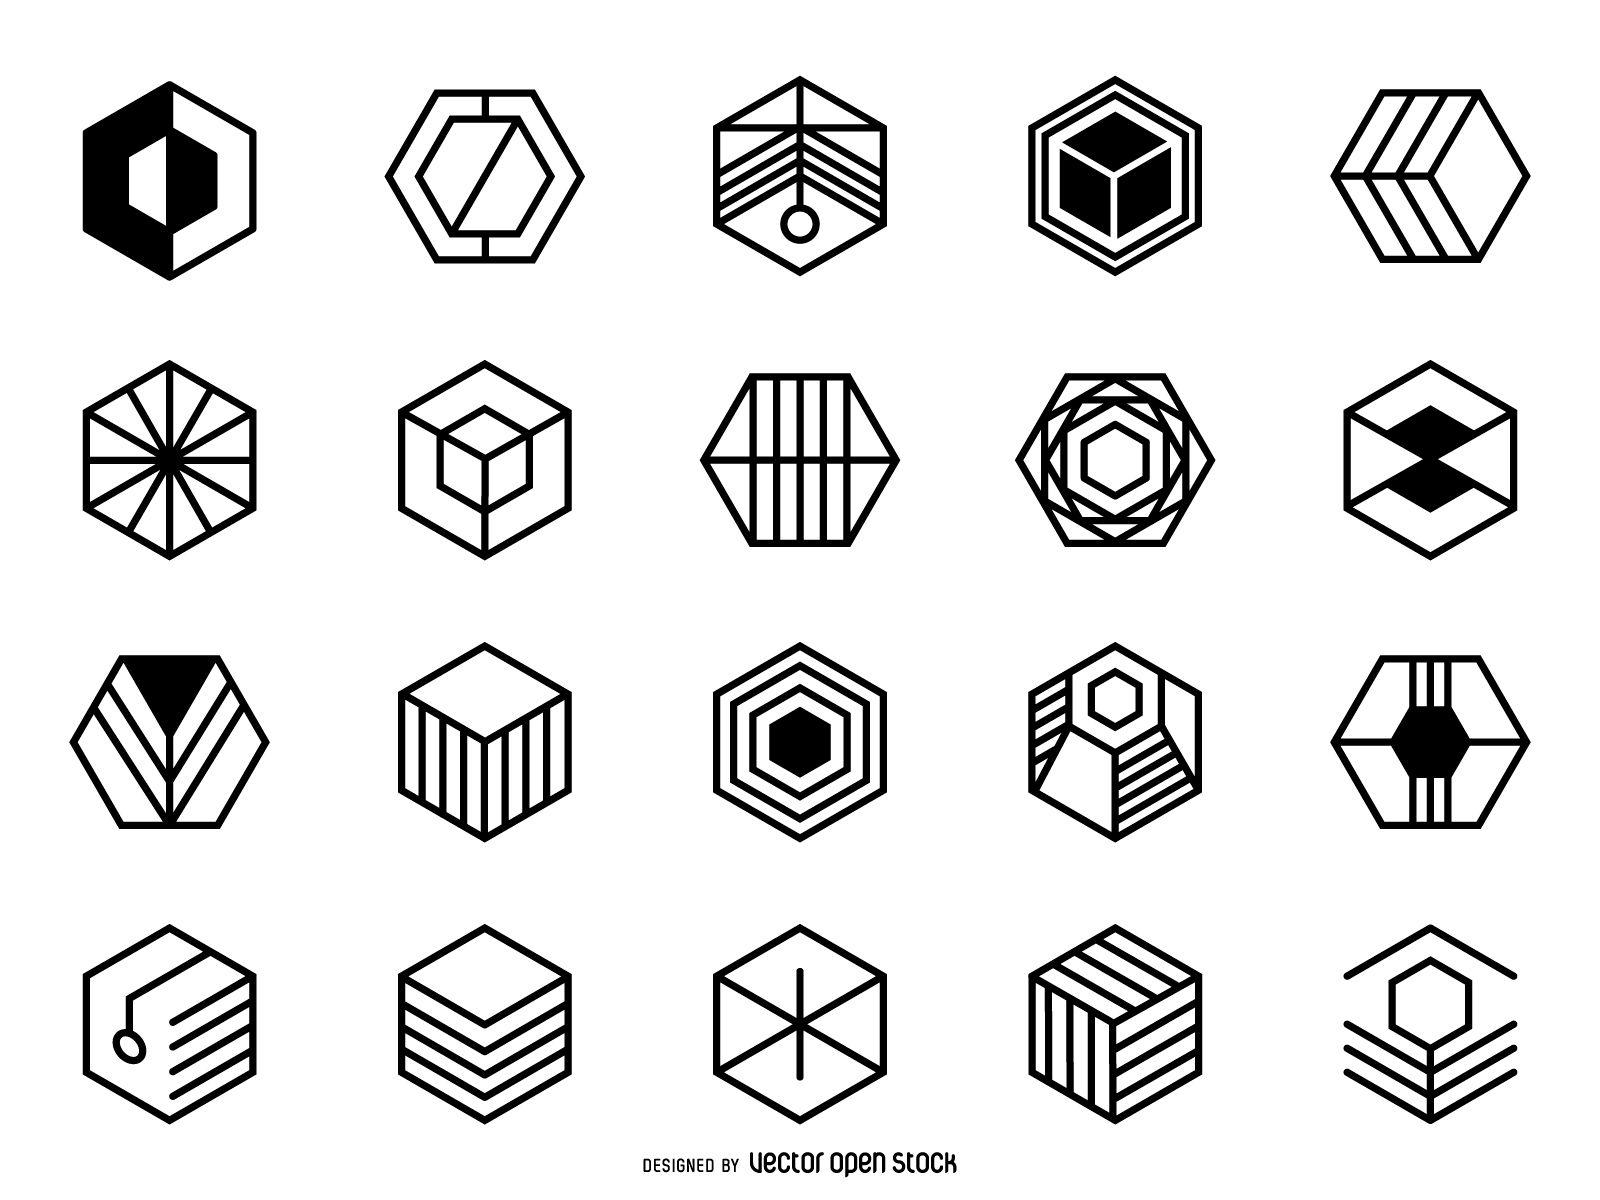 Image result for badge design ideas | I JUST LIKE IT | Pinterest ...